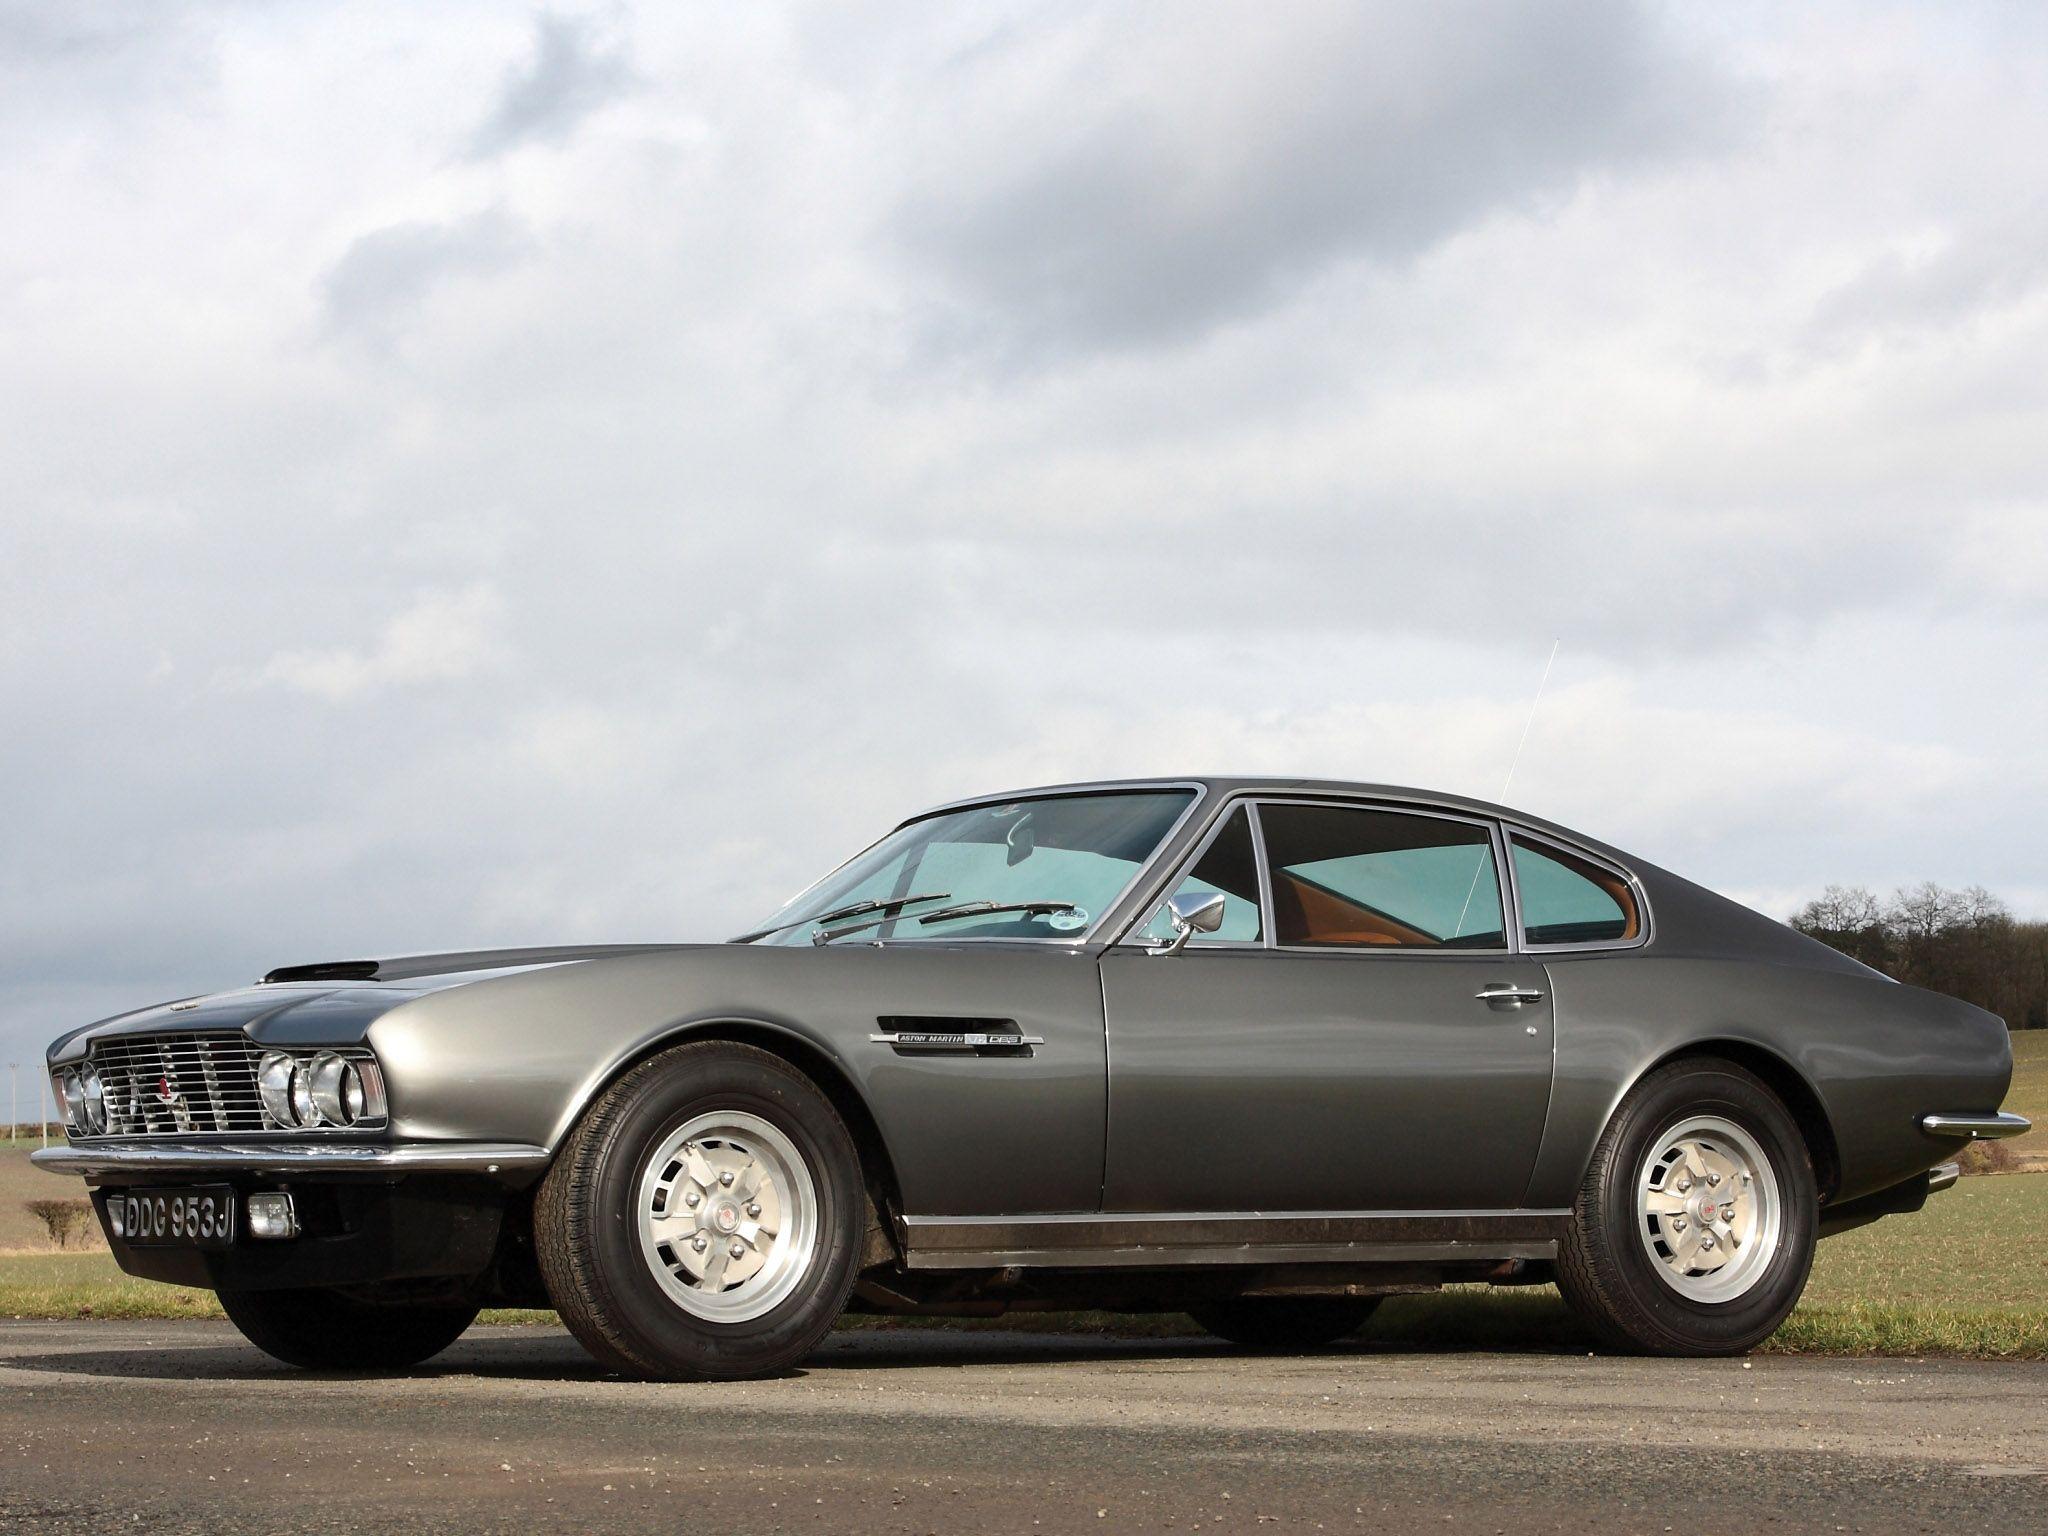 Aston Martin DBS, 1967